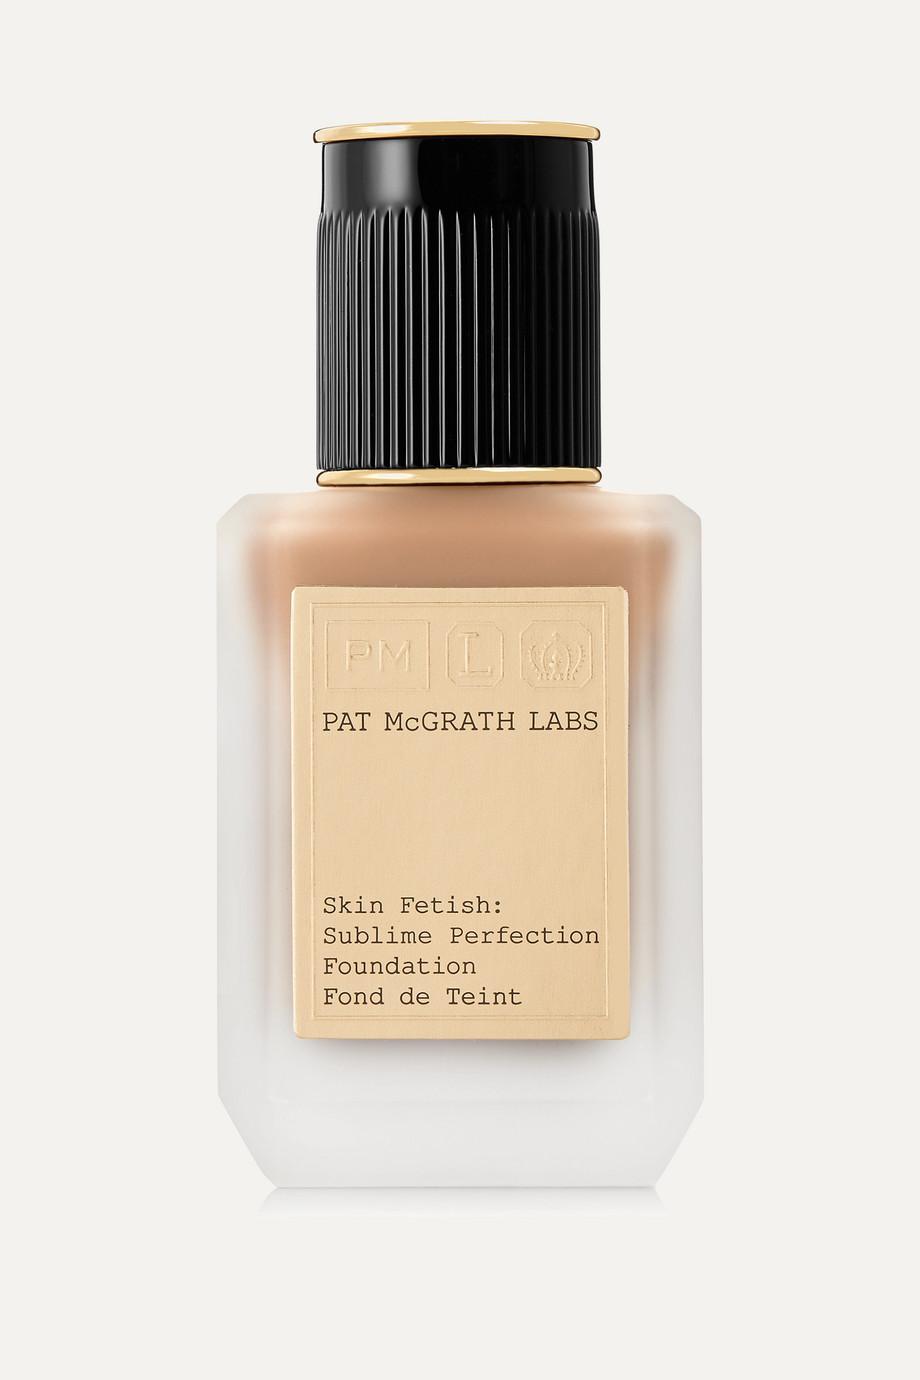 Pat McGrath Labs Skin Fetish: Sublime Perfection Foundation - Light Medium 13, 35ml